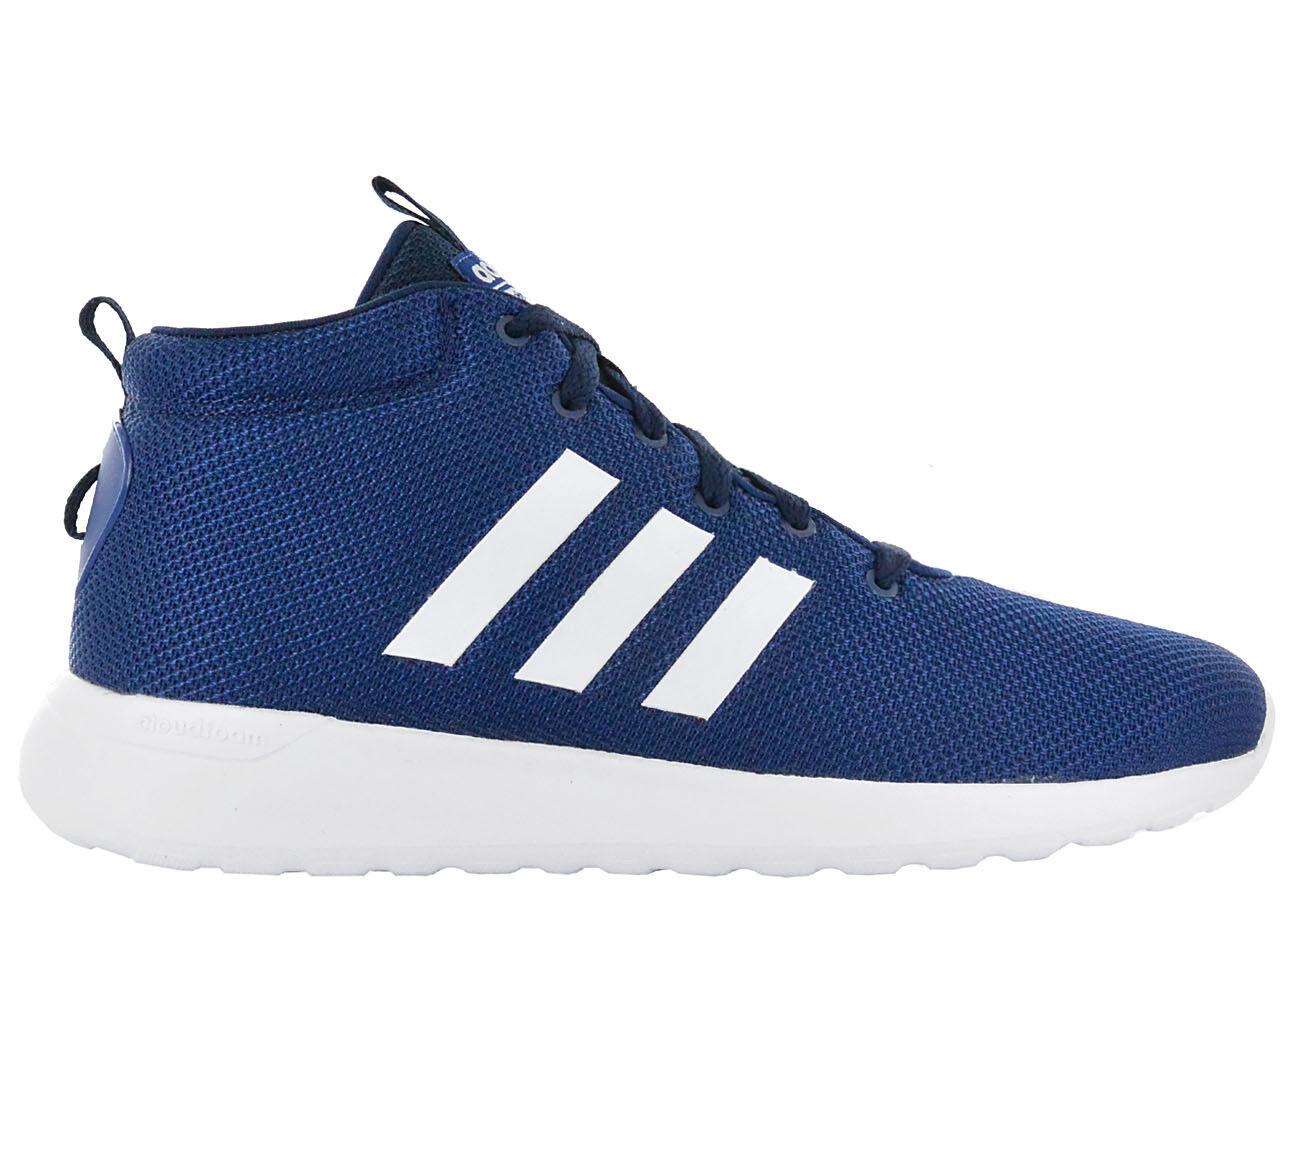 Adidas Zapatillas Deportivas Hombres Cloudfoam Lite Racer Mid Cf Zapatos Azul de